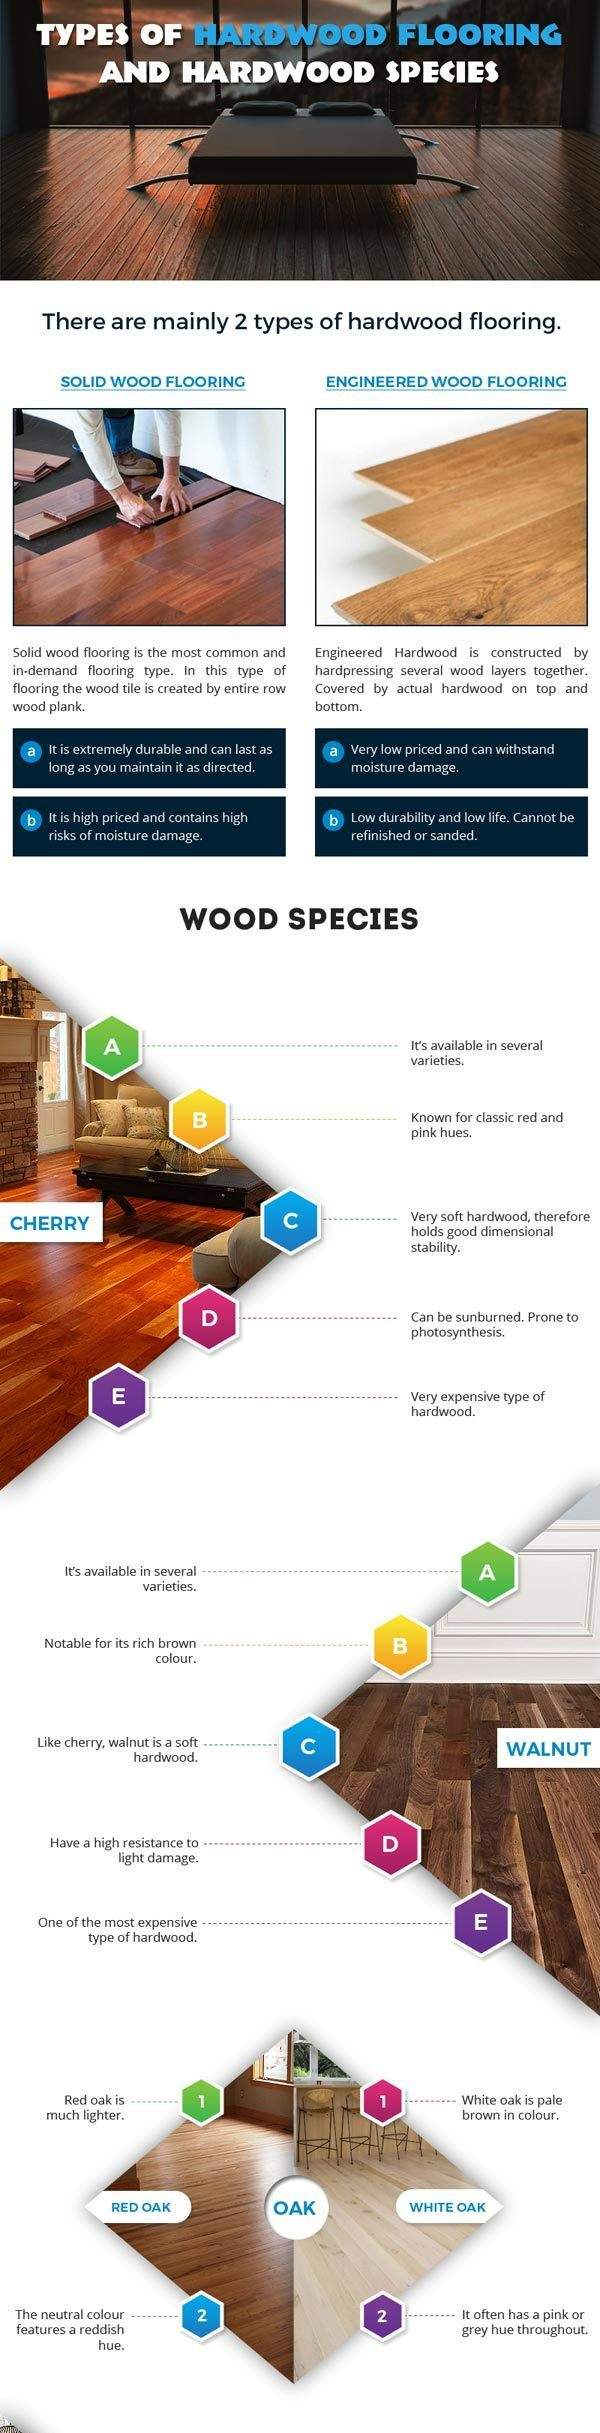 Wood-Species-for-Hardwood-Flooring-1